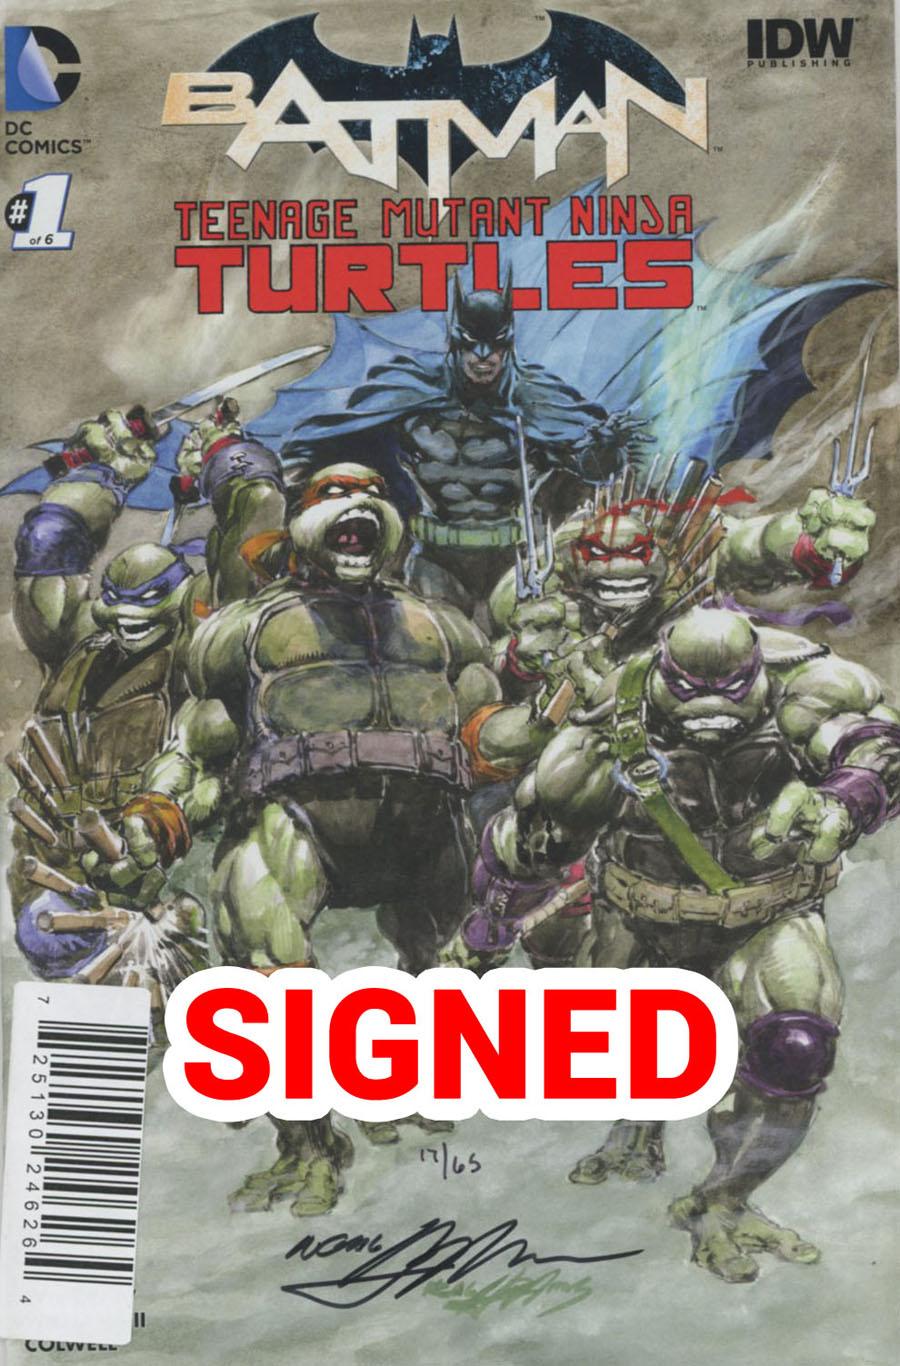 Batman Teenage Mutant Ninja Turtles #1 Cover I DF Exclusive Neal Adams Color Variant Cover Signed By Neal Adams